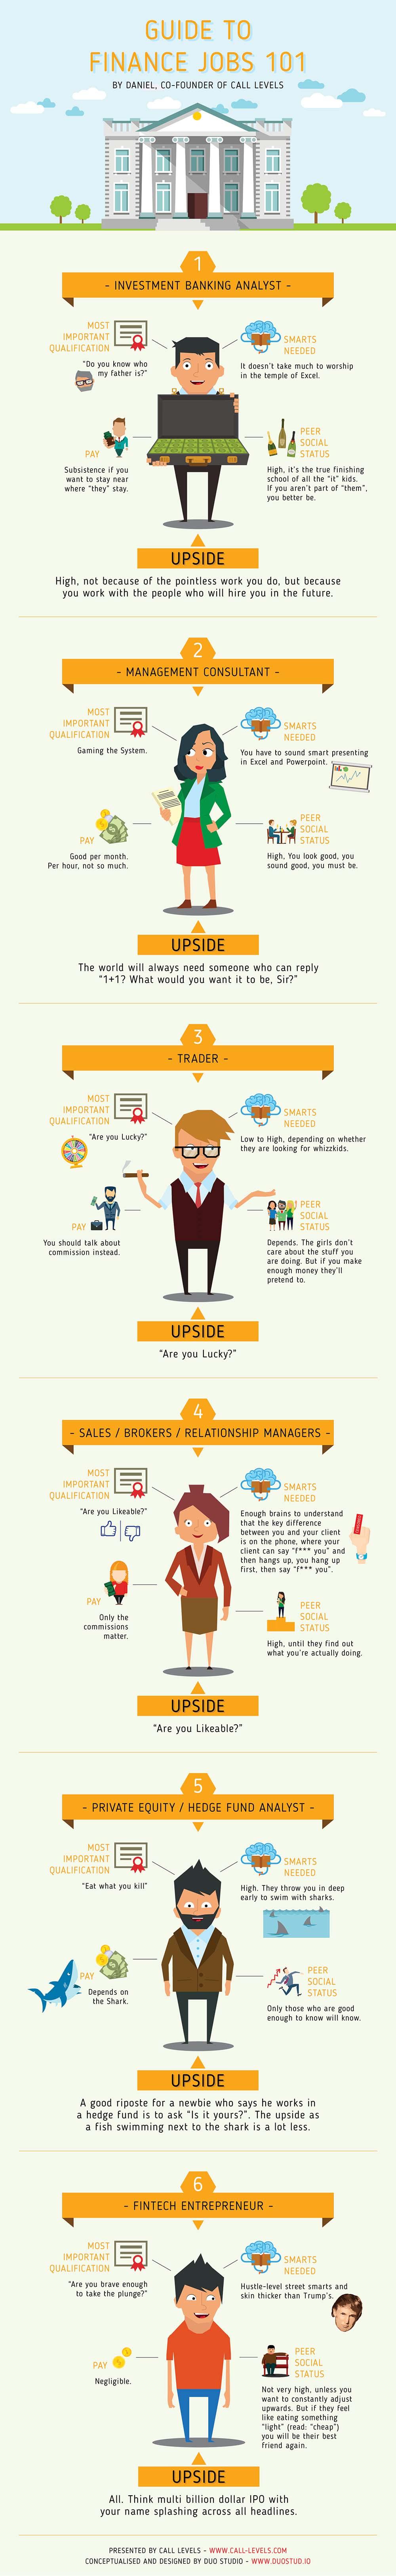 Ultimate Cheatsheet to Finance Industry Careers